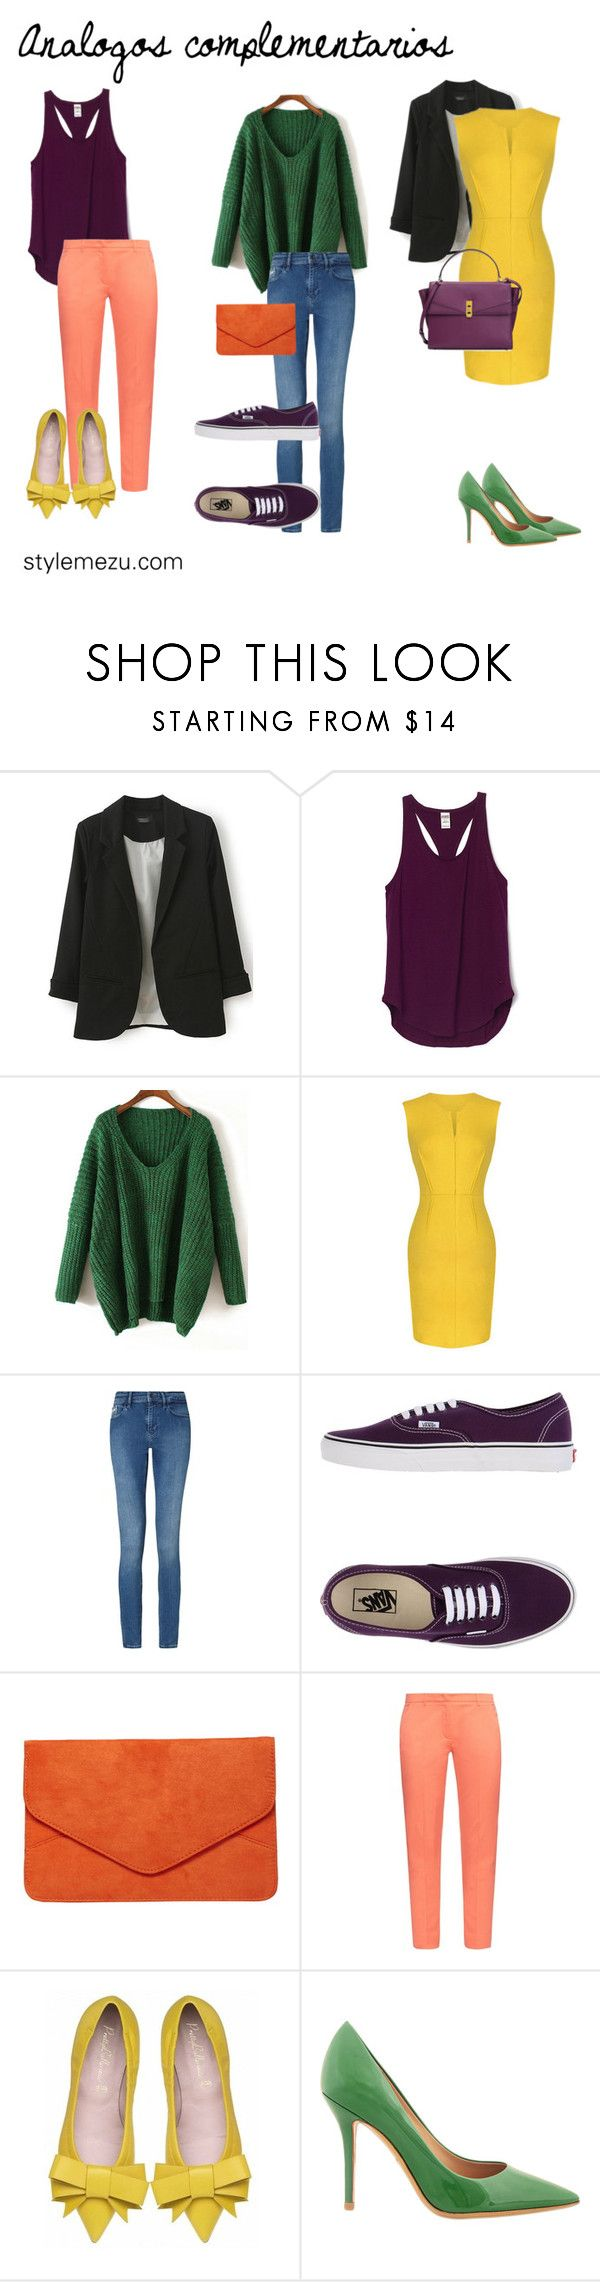 colores análogos by stylemezu on Polyvore featuring Weekend Max Mara, Calvin Klein, Salvatore Ferragamo, Vans, Henri Bendel and Dorothy Perkins